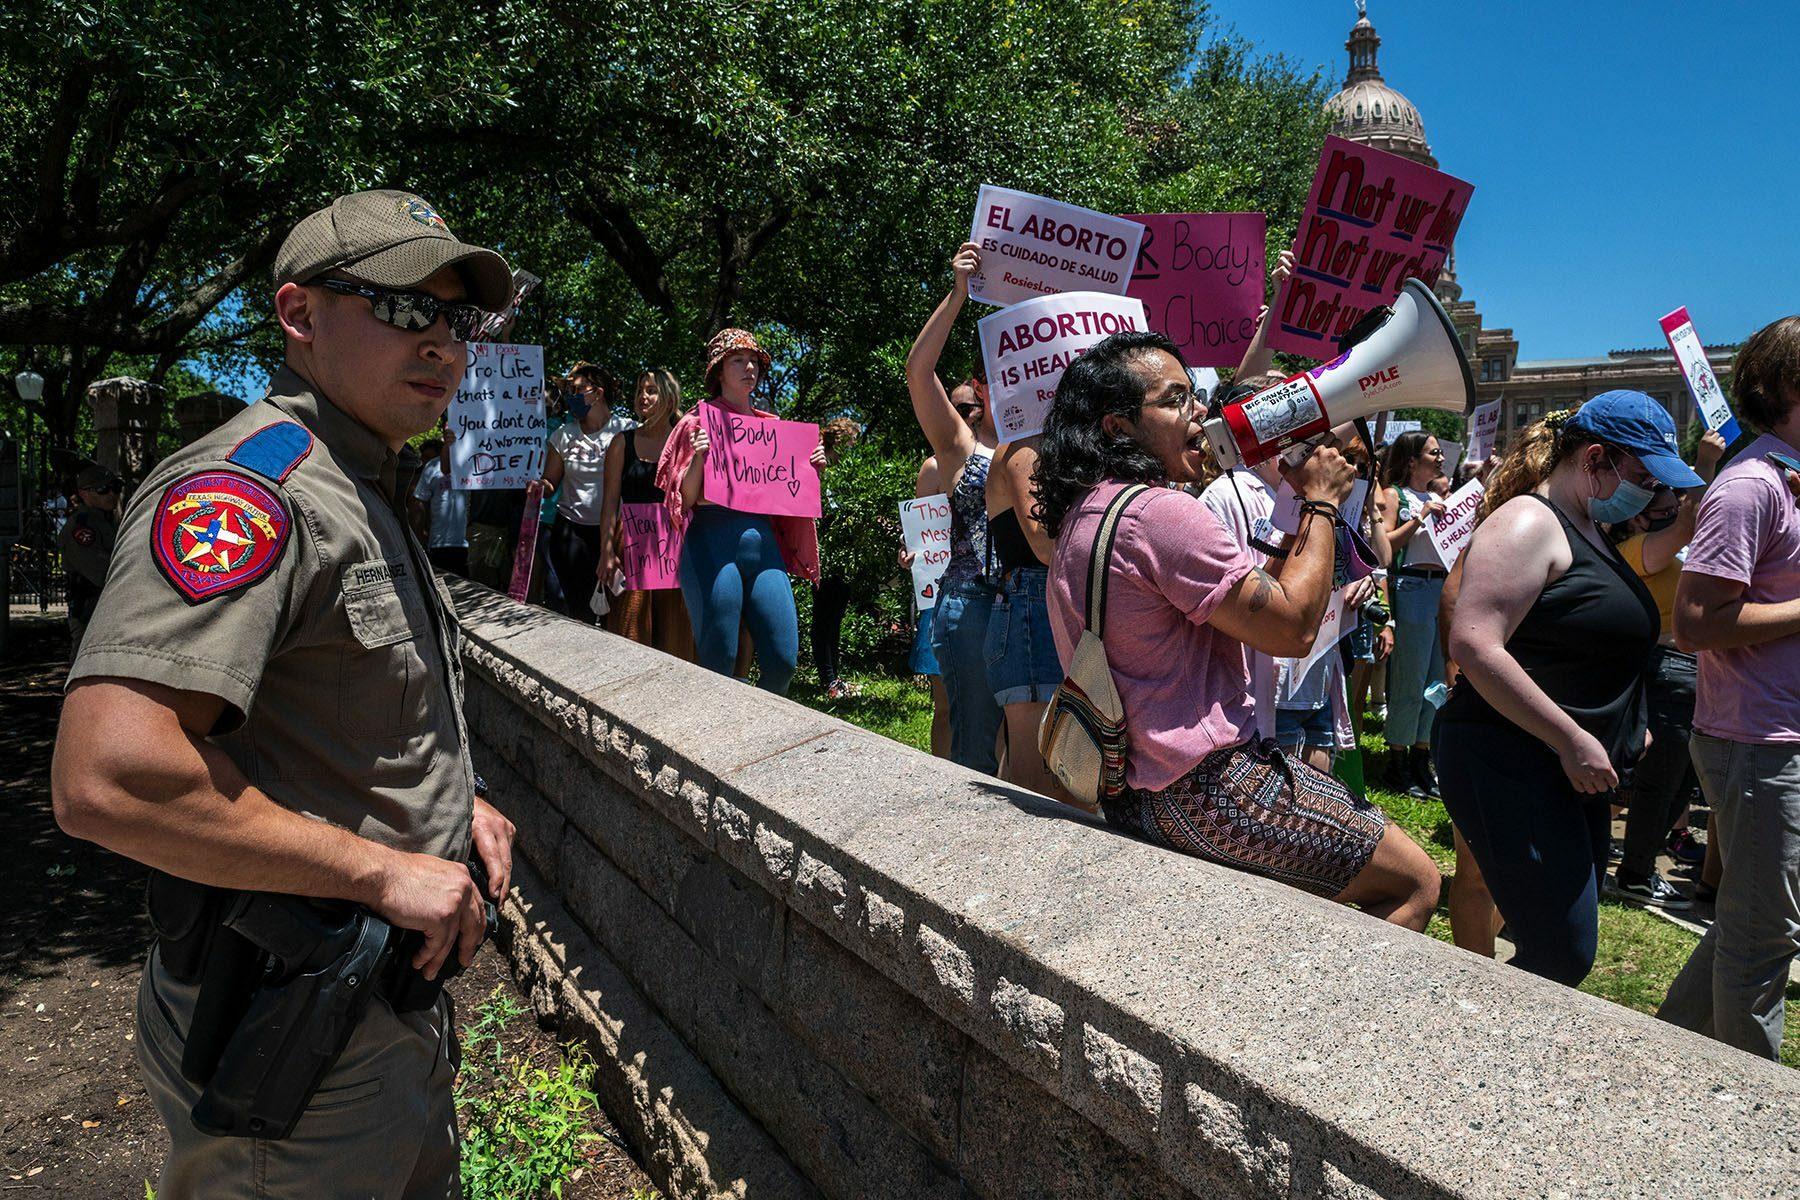 A capitol policeman surveils demonstrators.